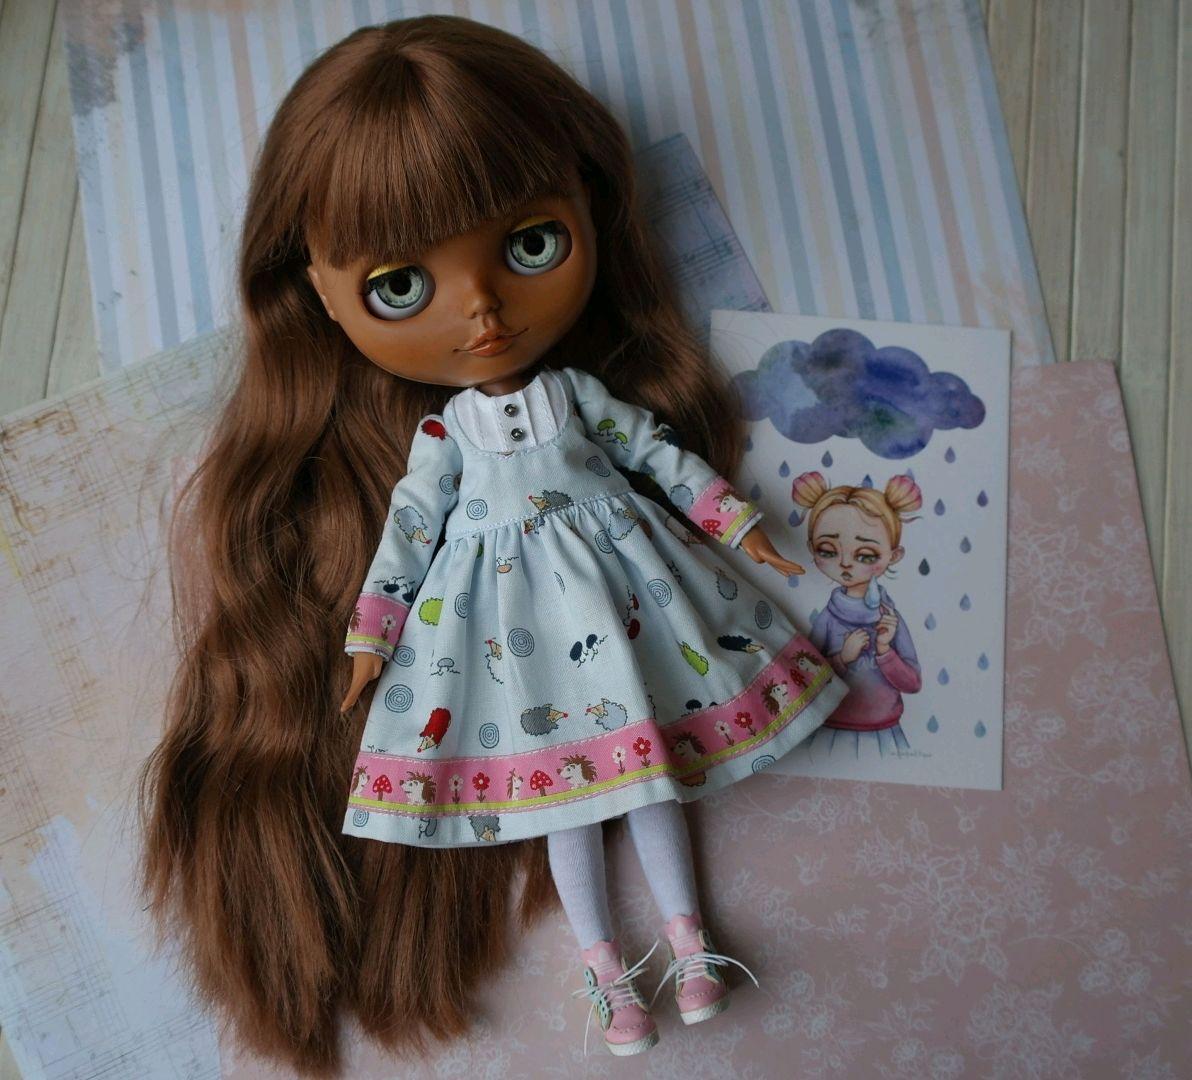 Платье для блайз. Одежда для кукол. Аутфит. Outfit for Blythe dolls, Одежда для кукол, Зеленоград, Фото №1